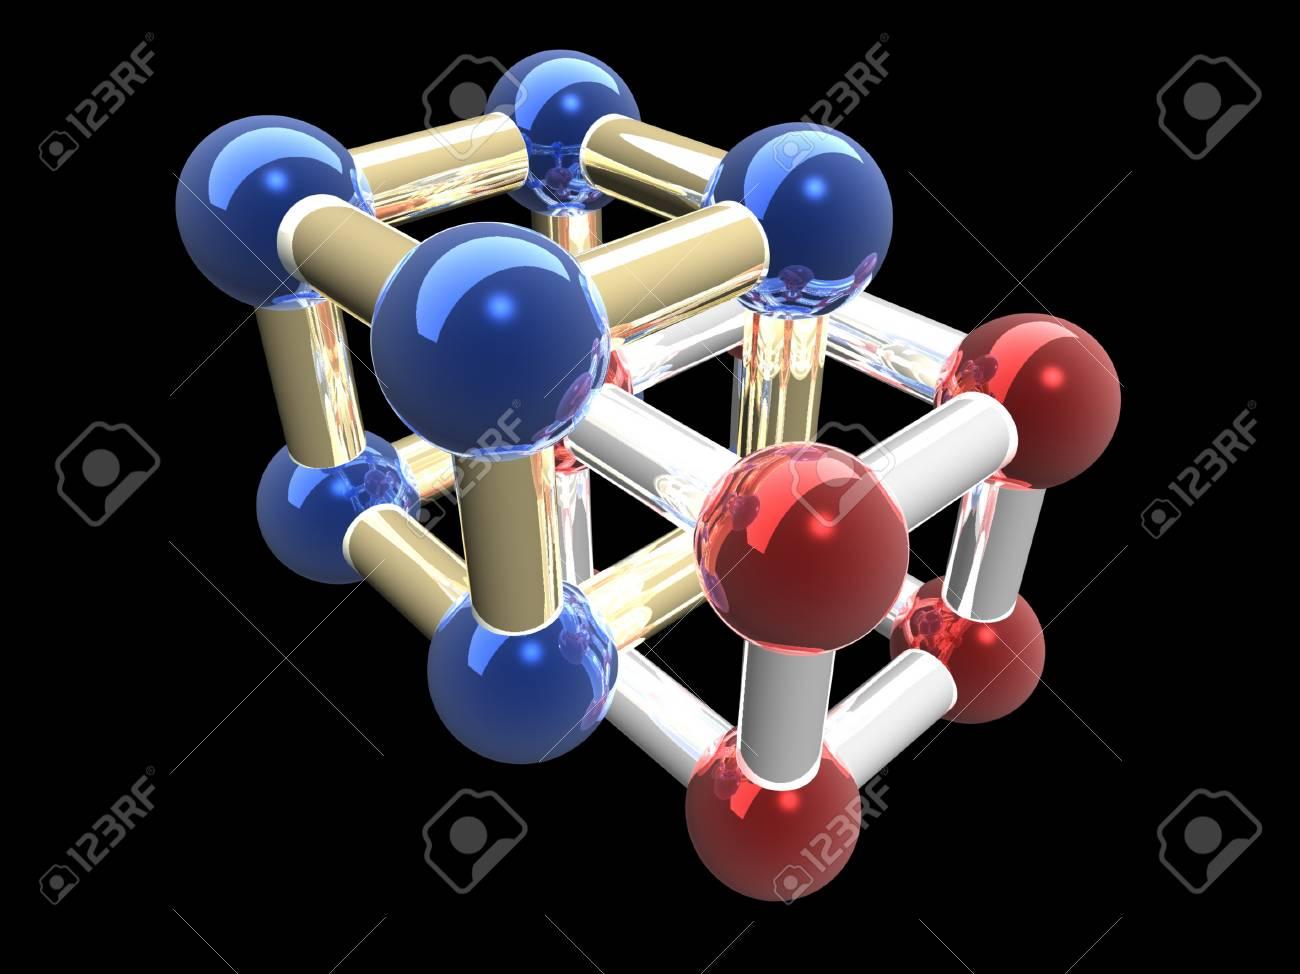 �rystalline lattice of molecule, 3D render. Stock Photo - 24888090